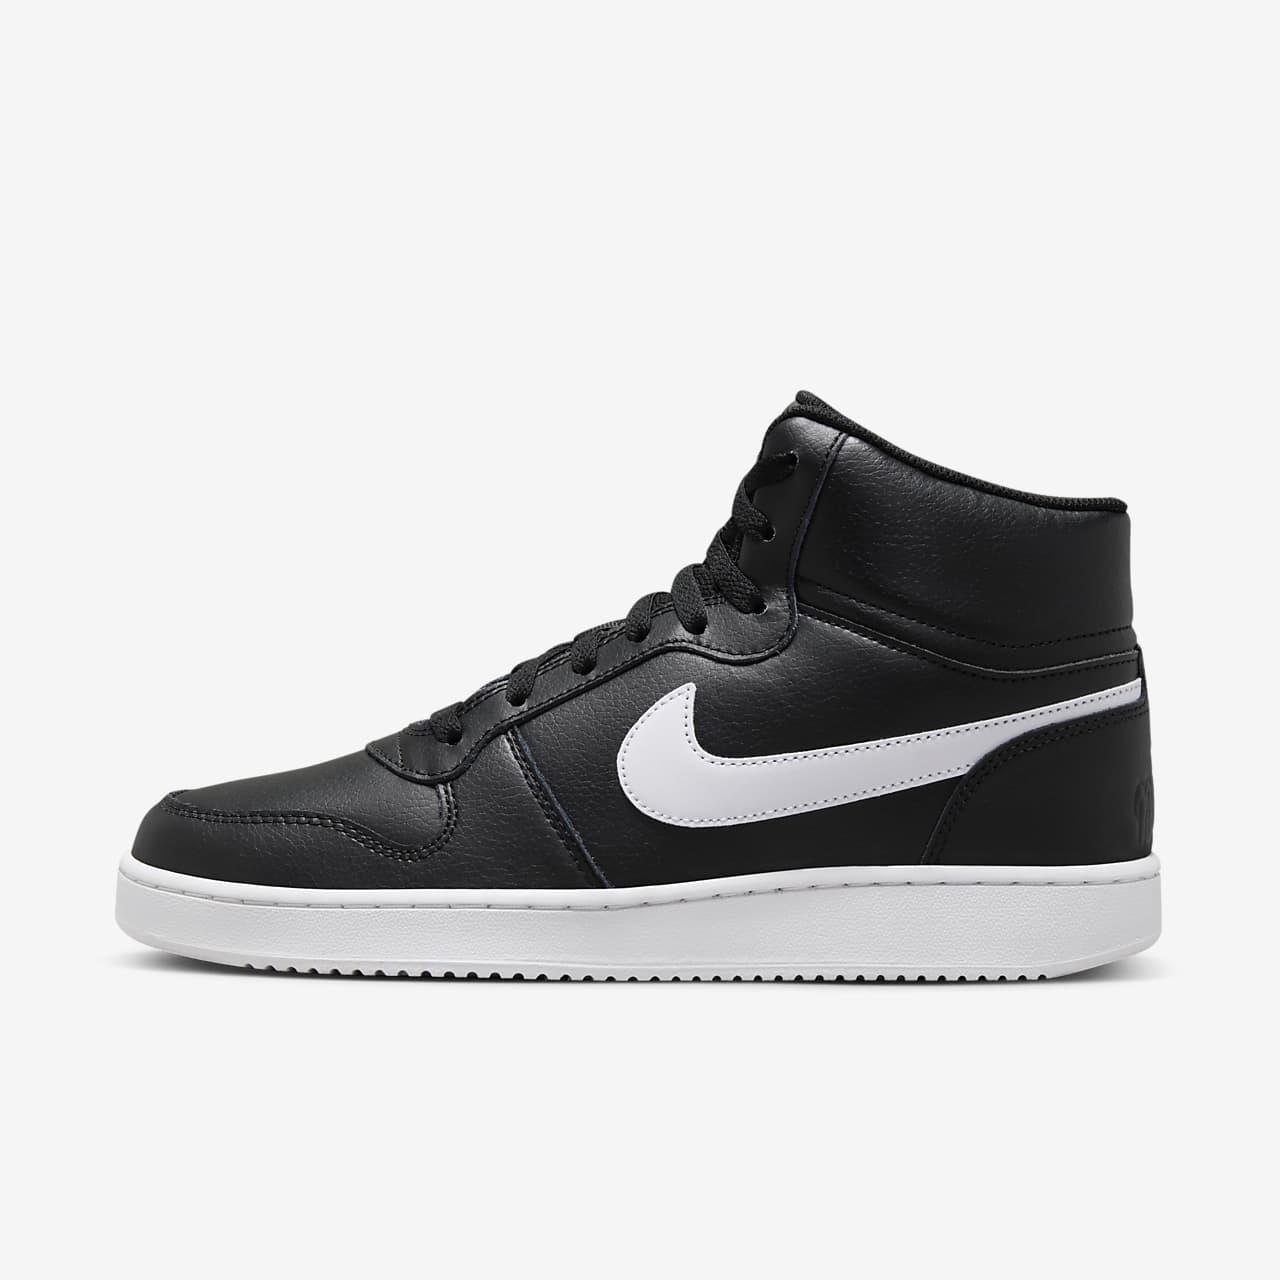 a28b1f99b40 Chaussure Nike Ebernon Mid pour Homme. Nike.com CA